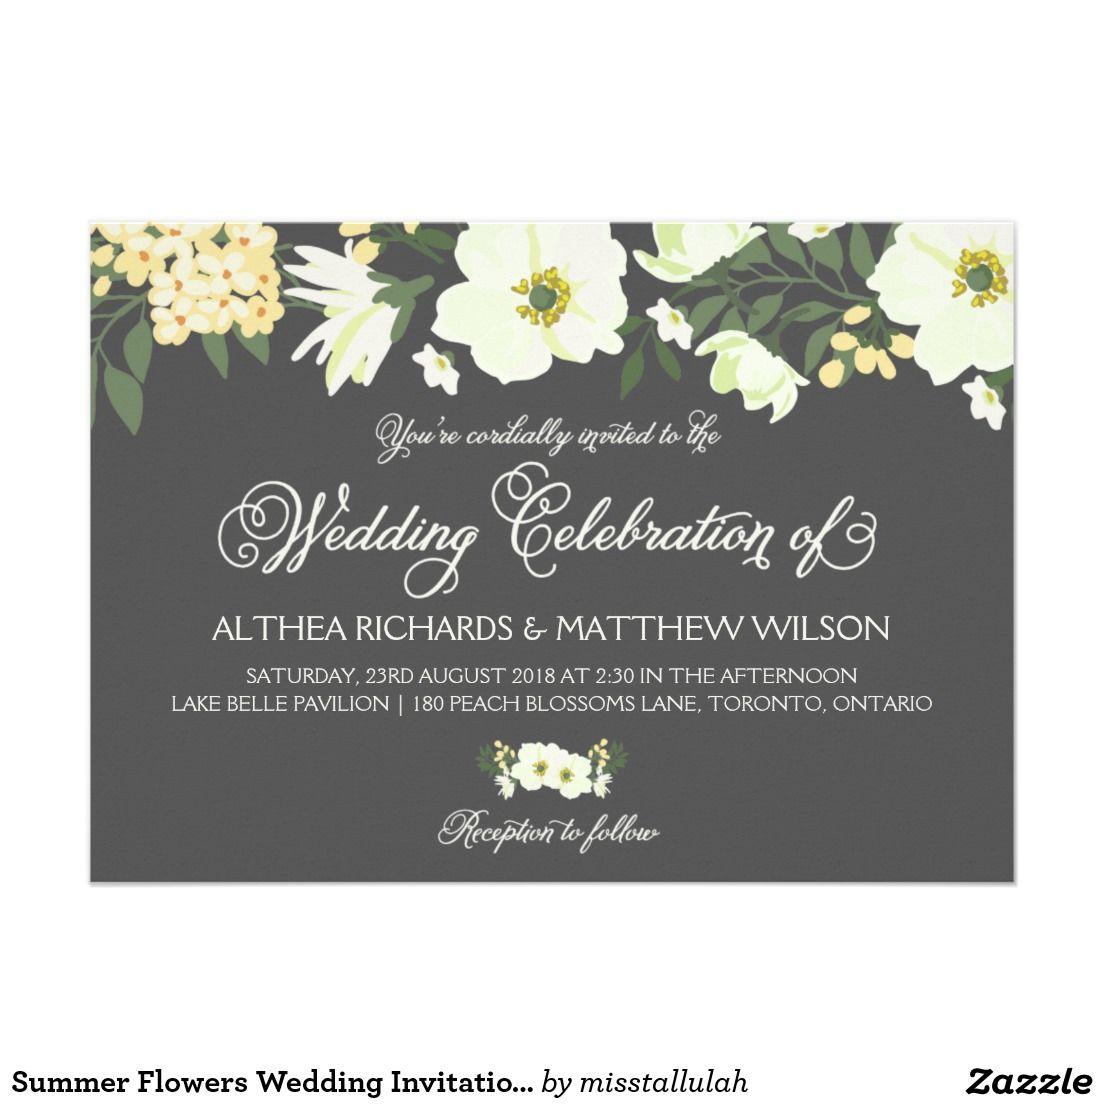 Summer Flowers Wedding Invitation | Yellow & Gray